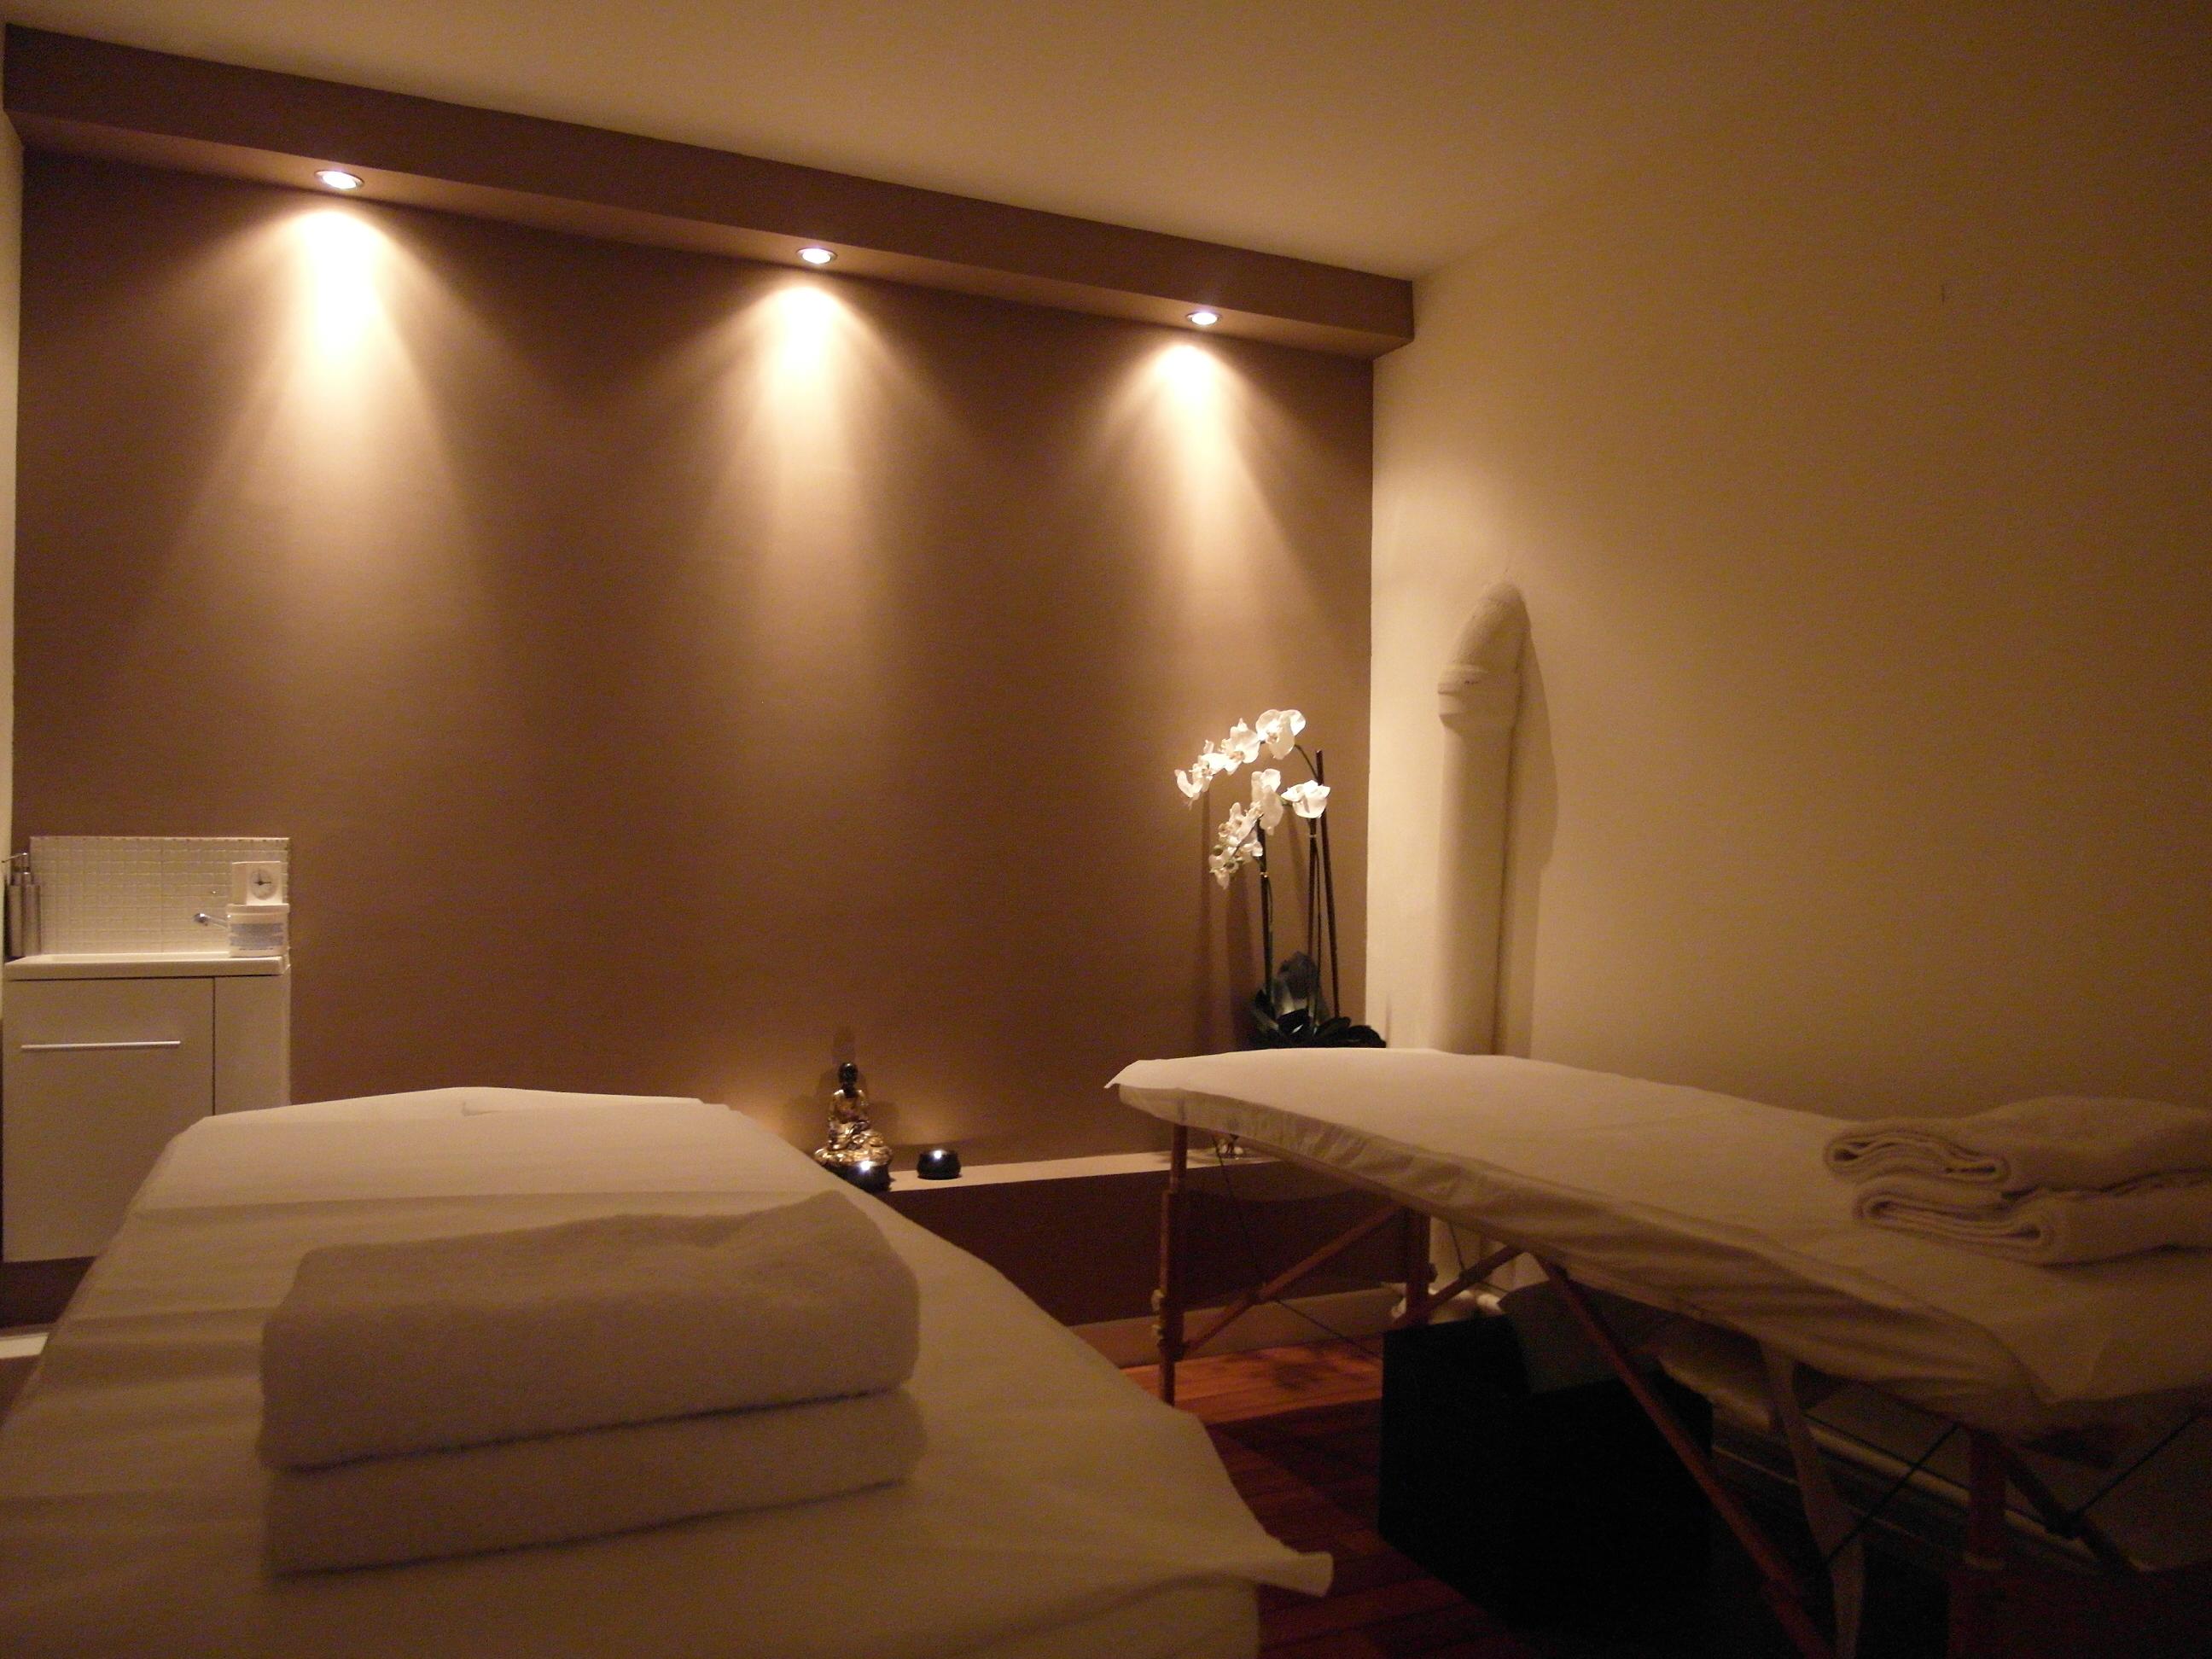 la maison du tui na 9 rue nicolo 75016 paris 01 45 24 53 89. Black Bedroom Furniture Sets. Home Design Ideas